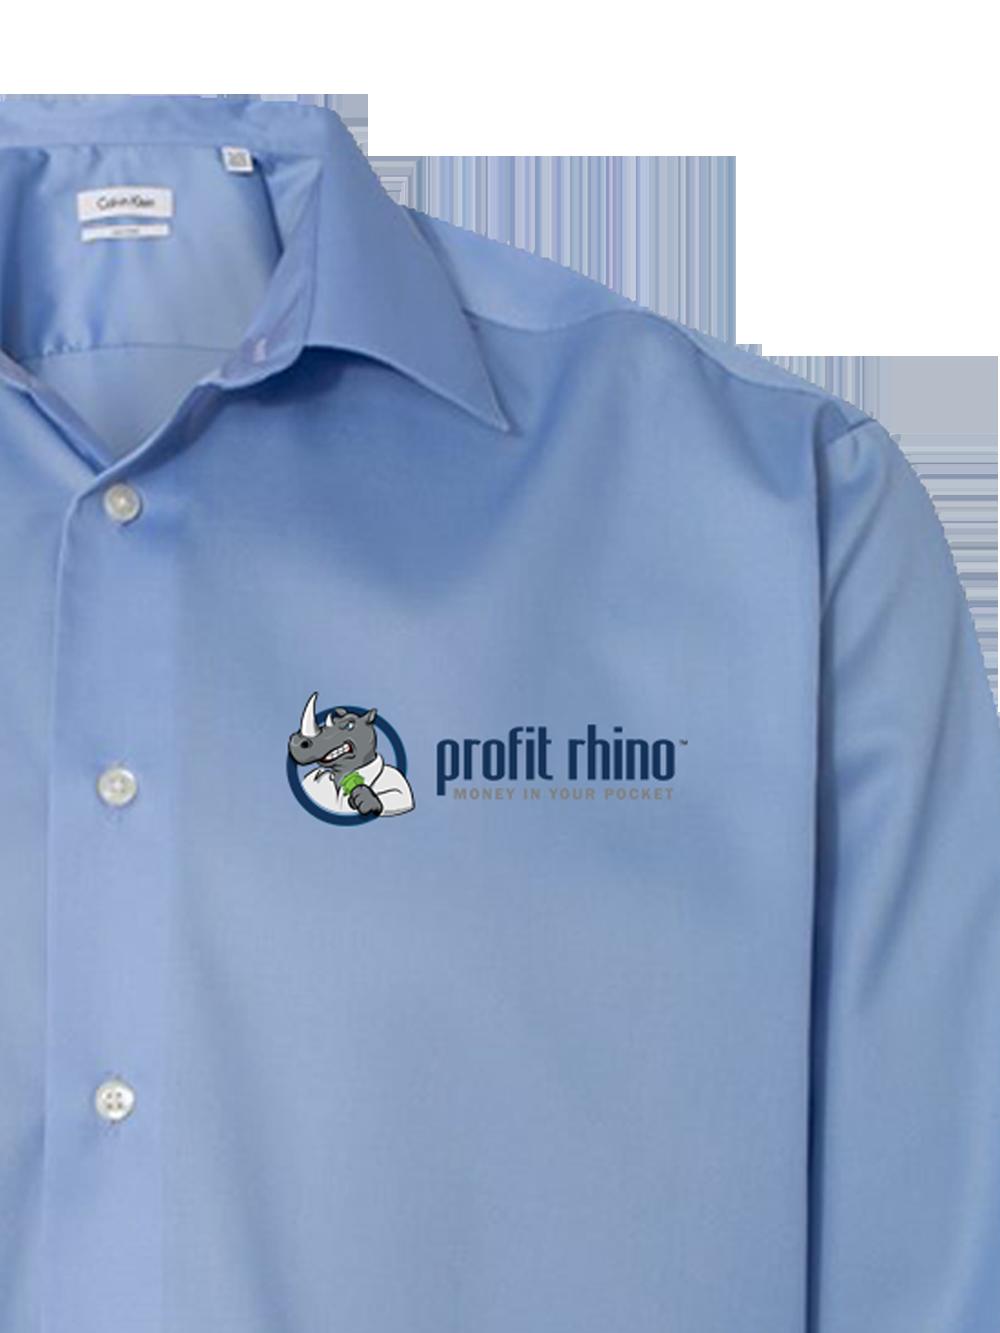 profit_r2-copy.png